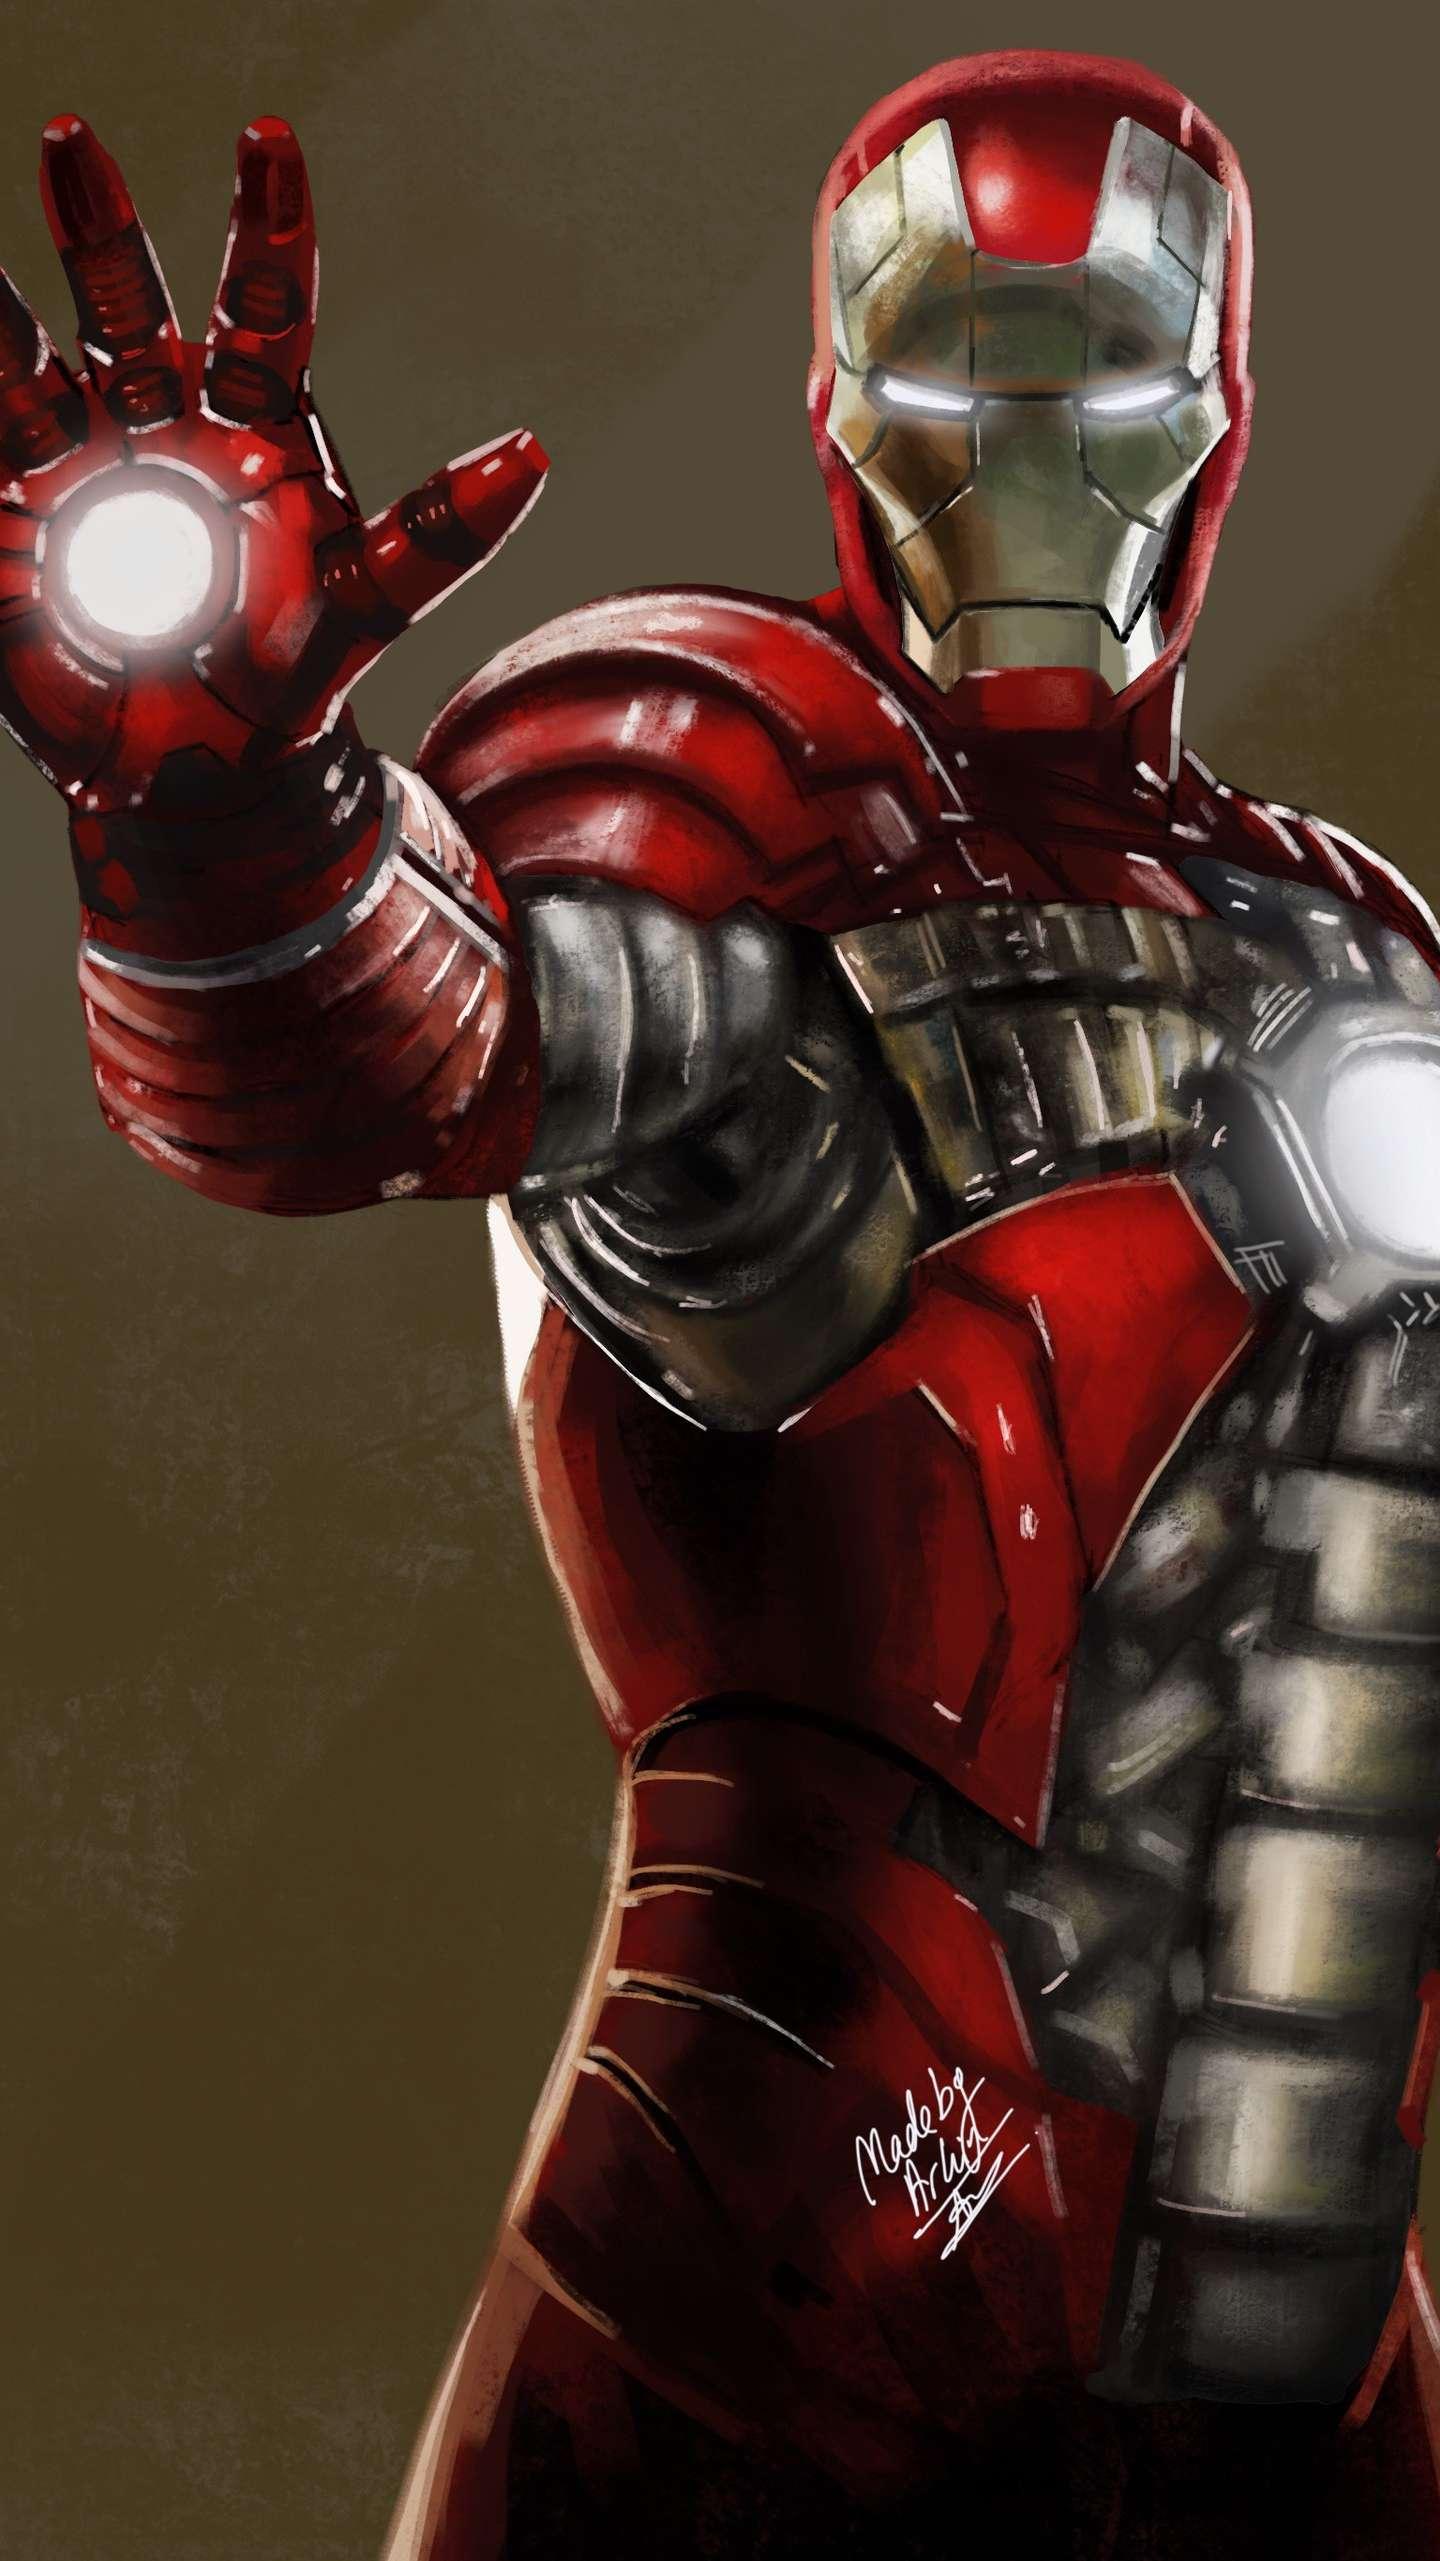 Iron Man Suitcase Armor Mark 5 iPhone Wallpaper